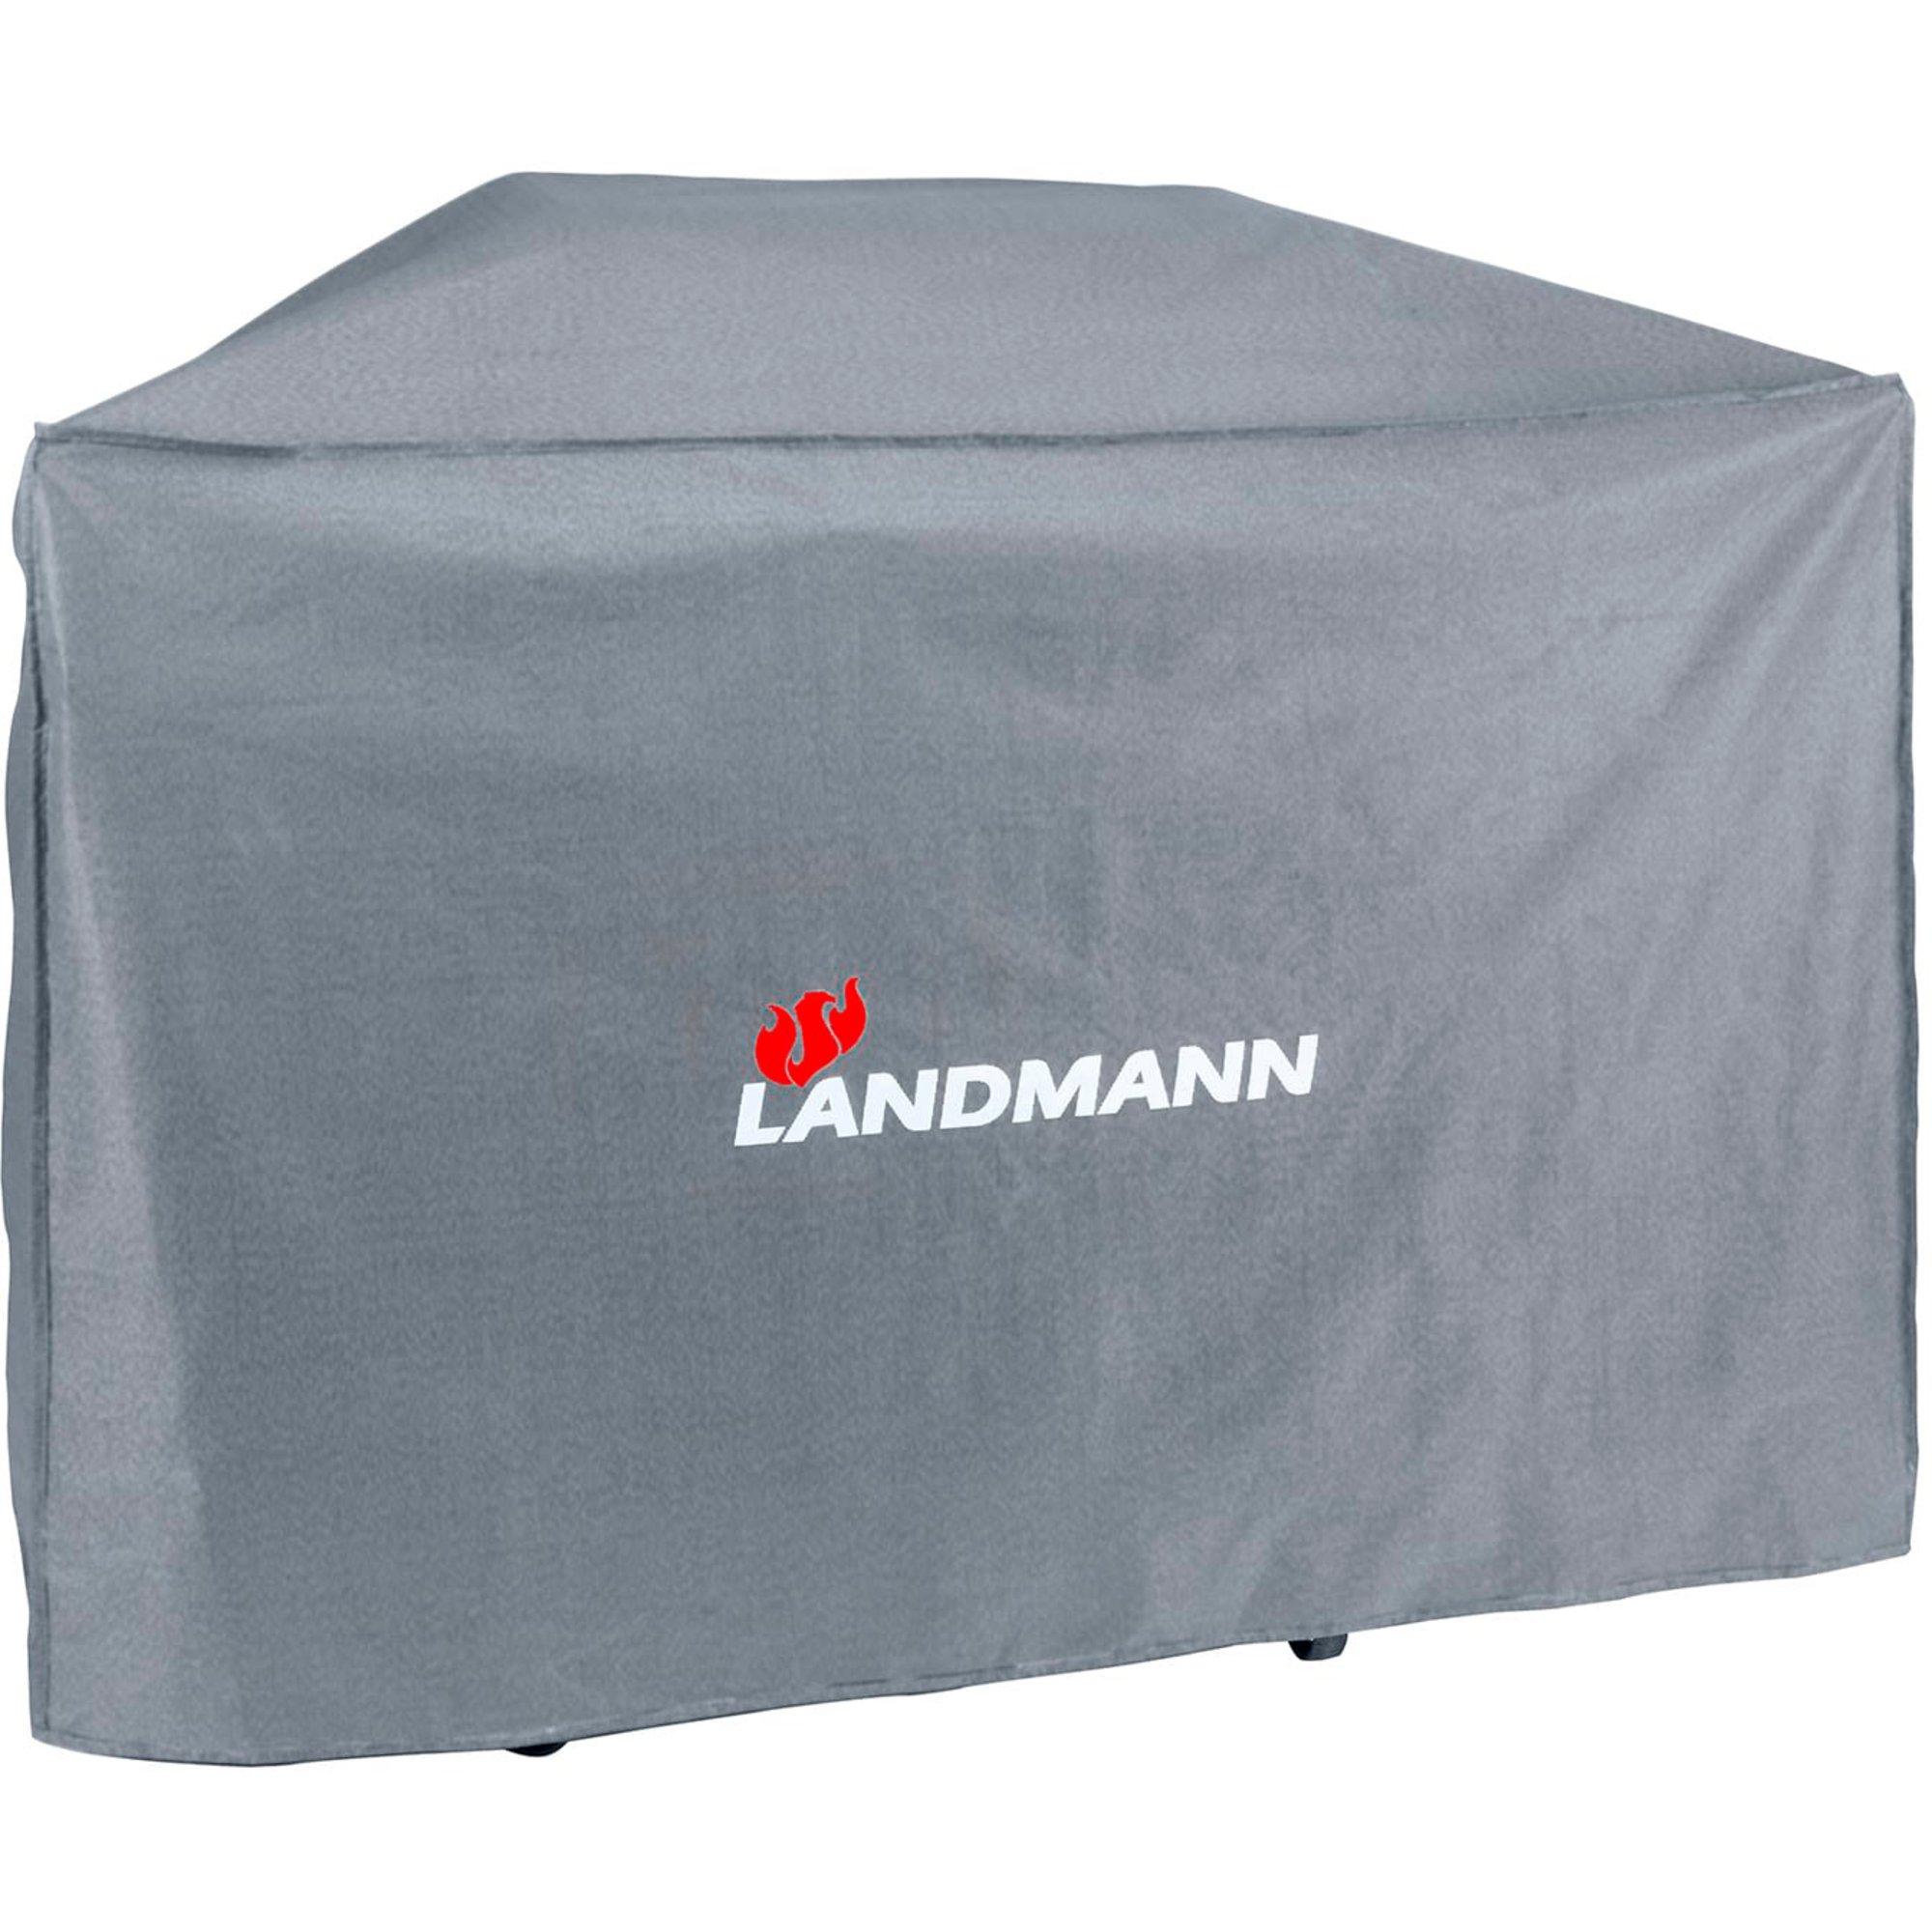 Landmann Premium Överdrag till grill